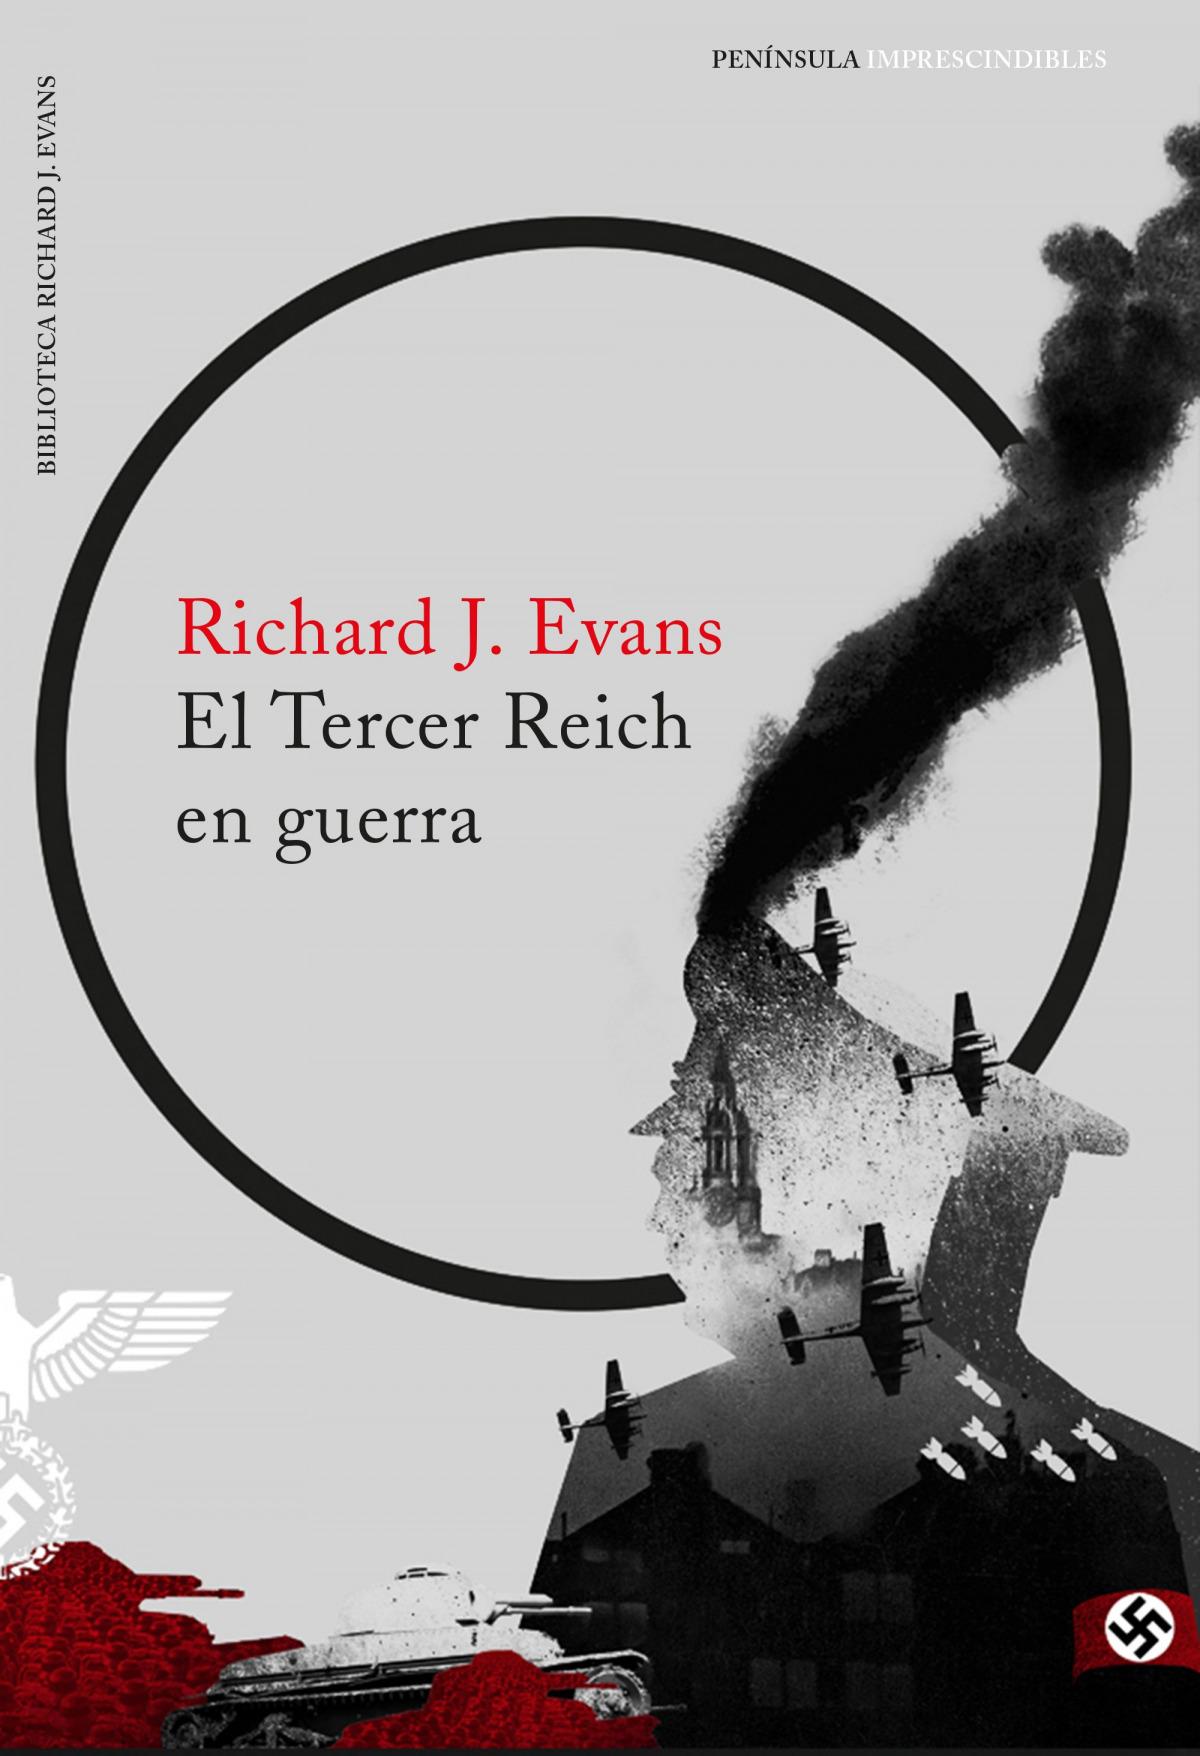 EL TERCER REICH EN GUERRA 9788499425689